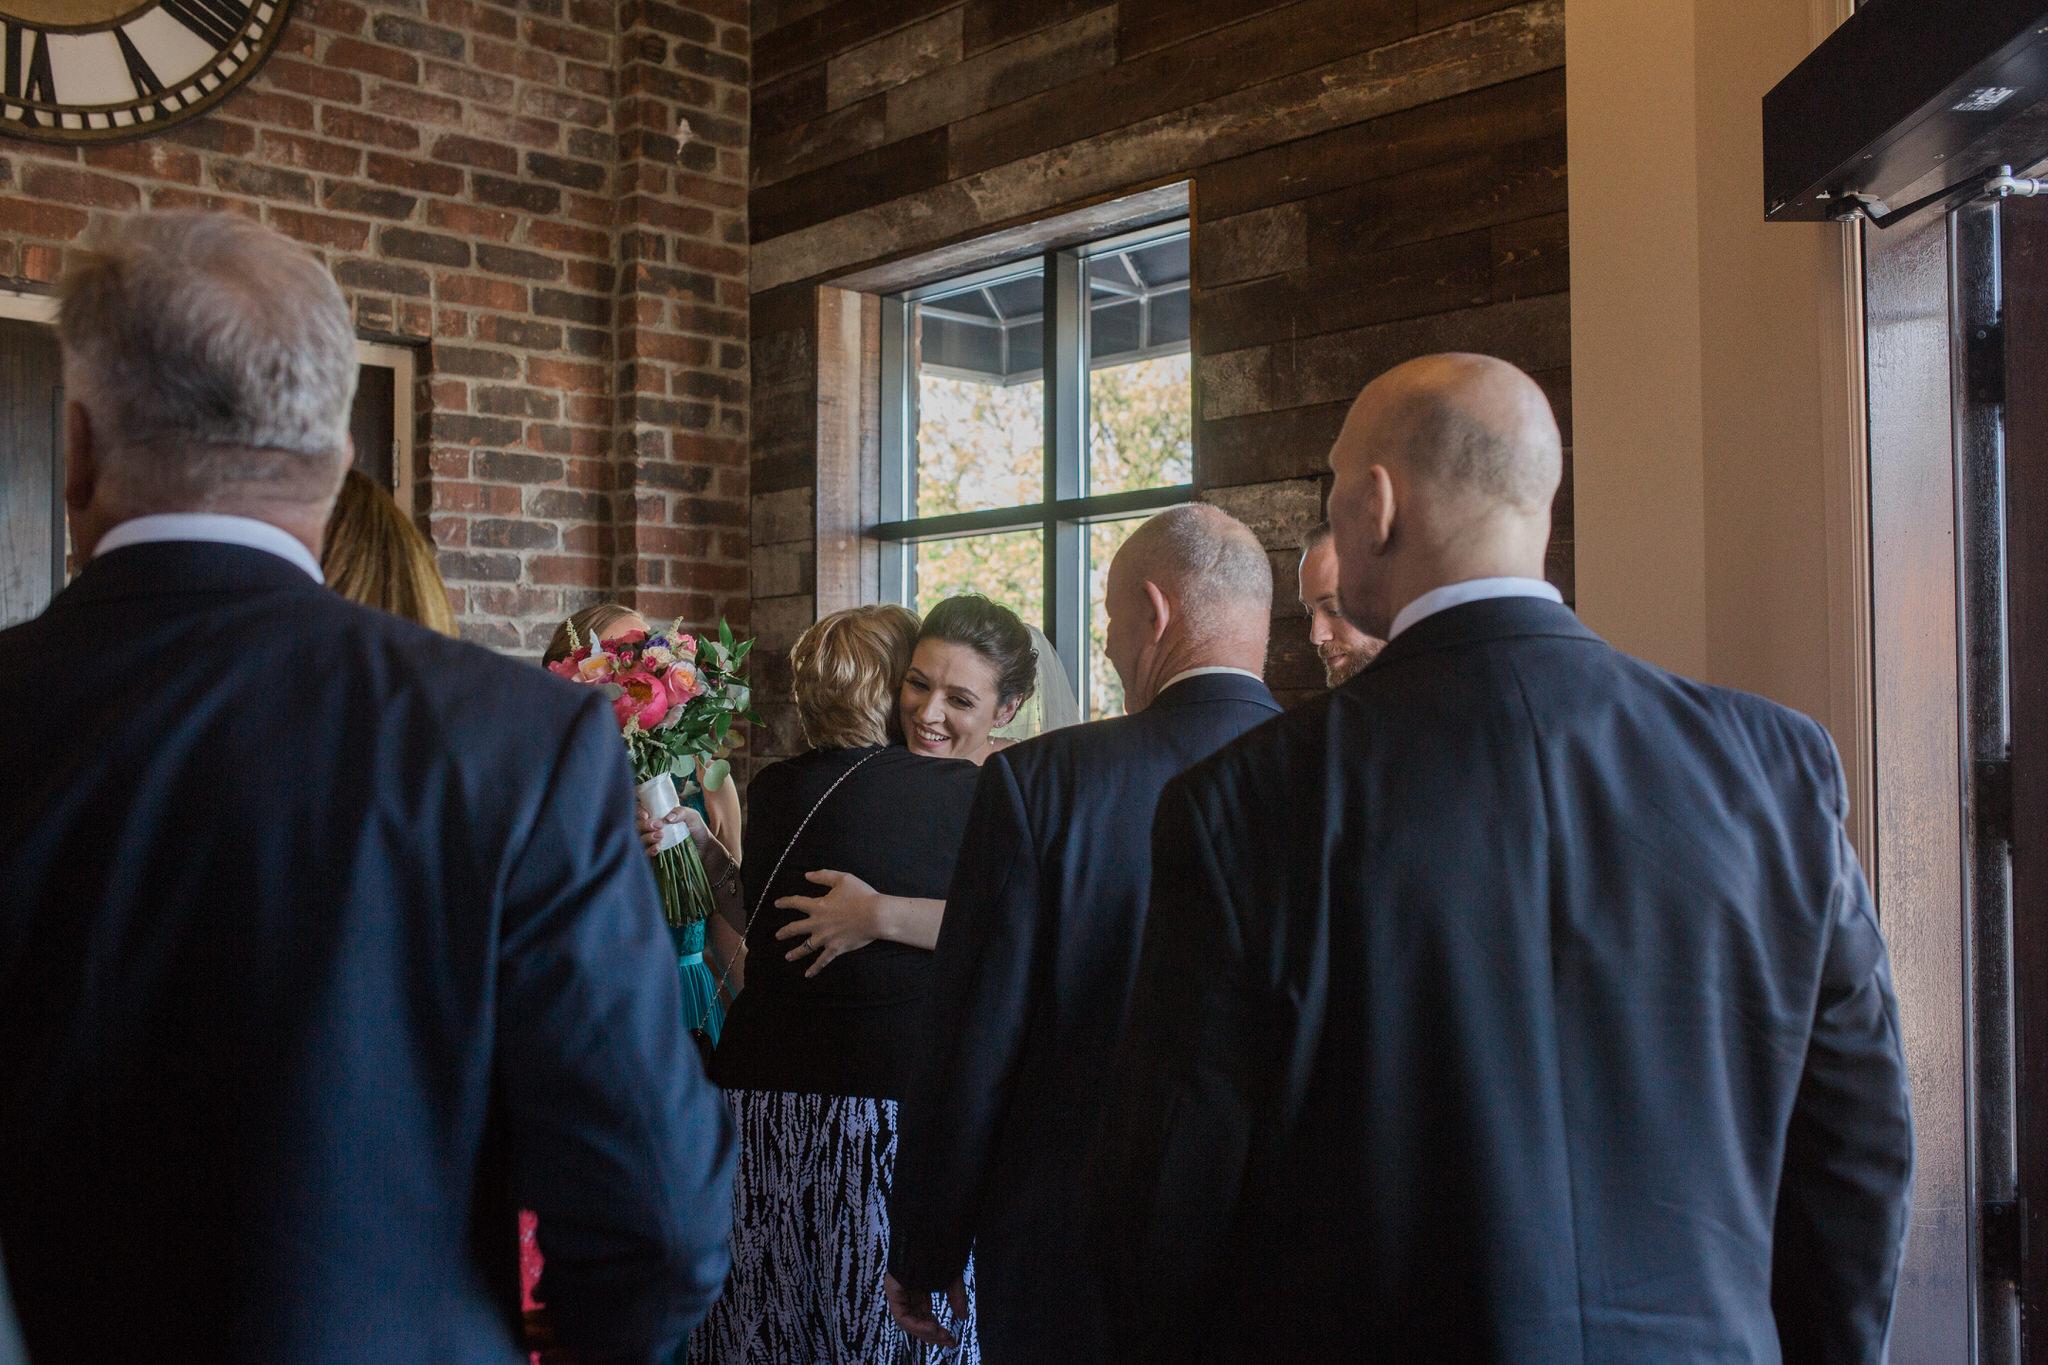 Brock Street Brewery Wedding - congratulations